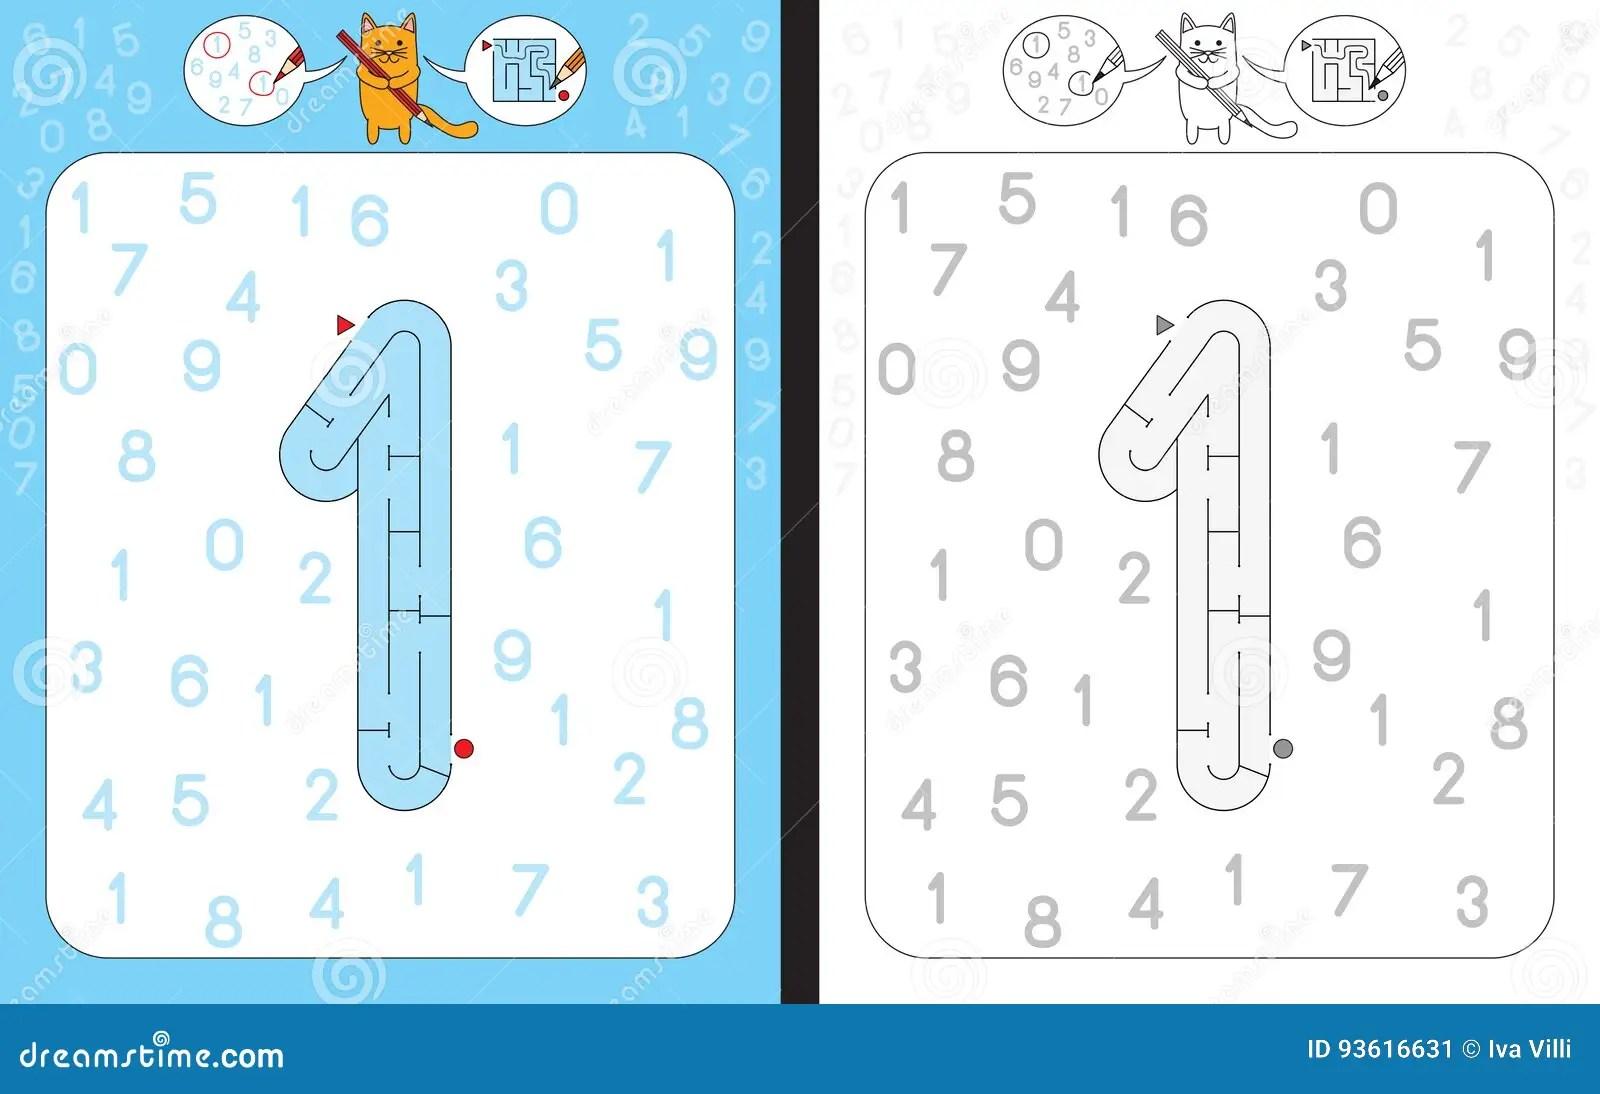 Maze Number 1 Stock Vector Illustration Of Illustration